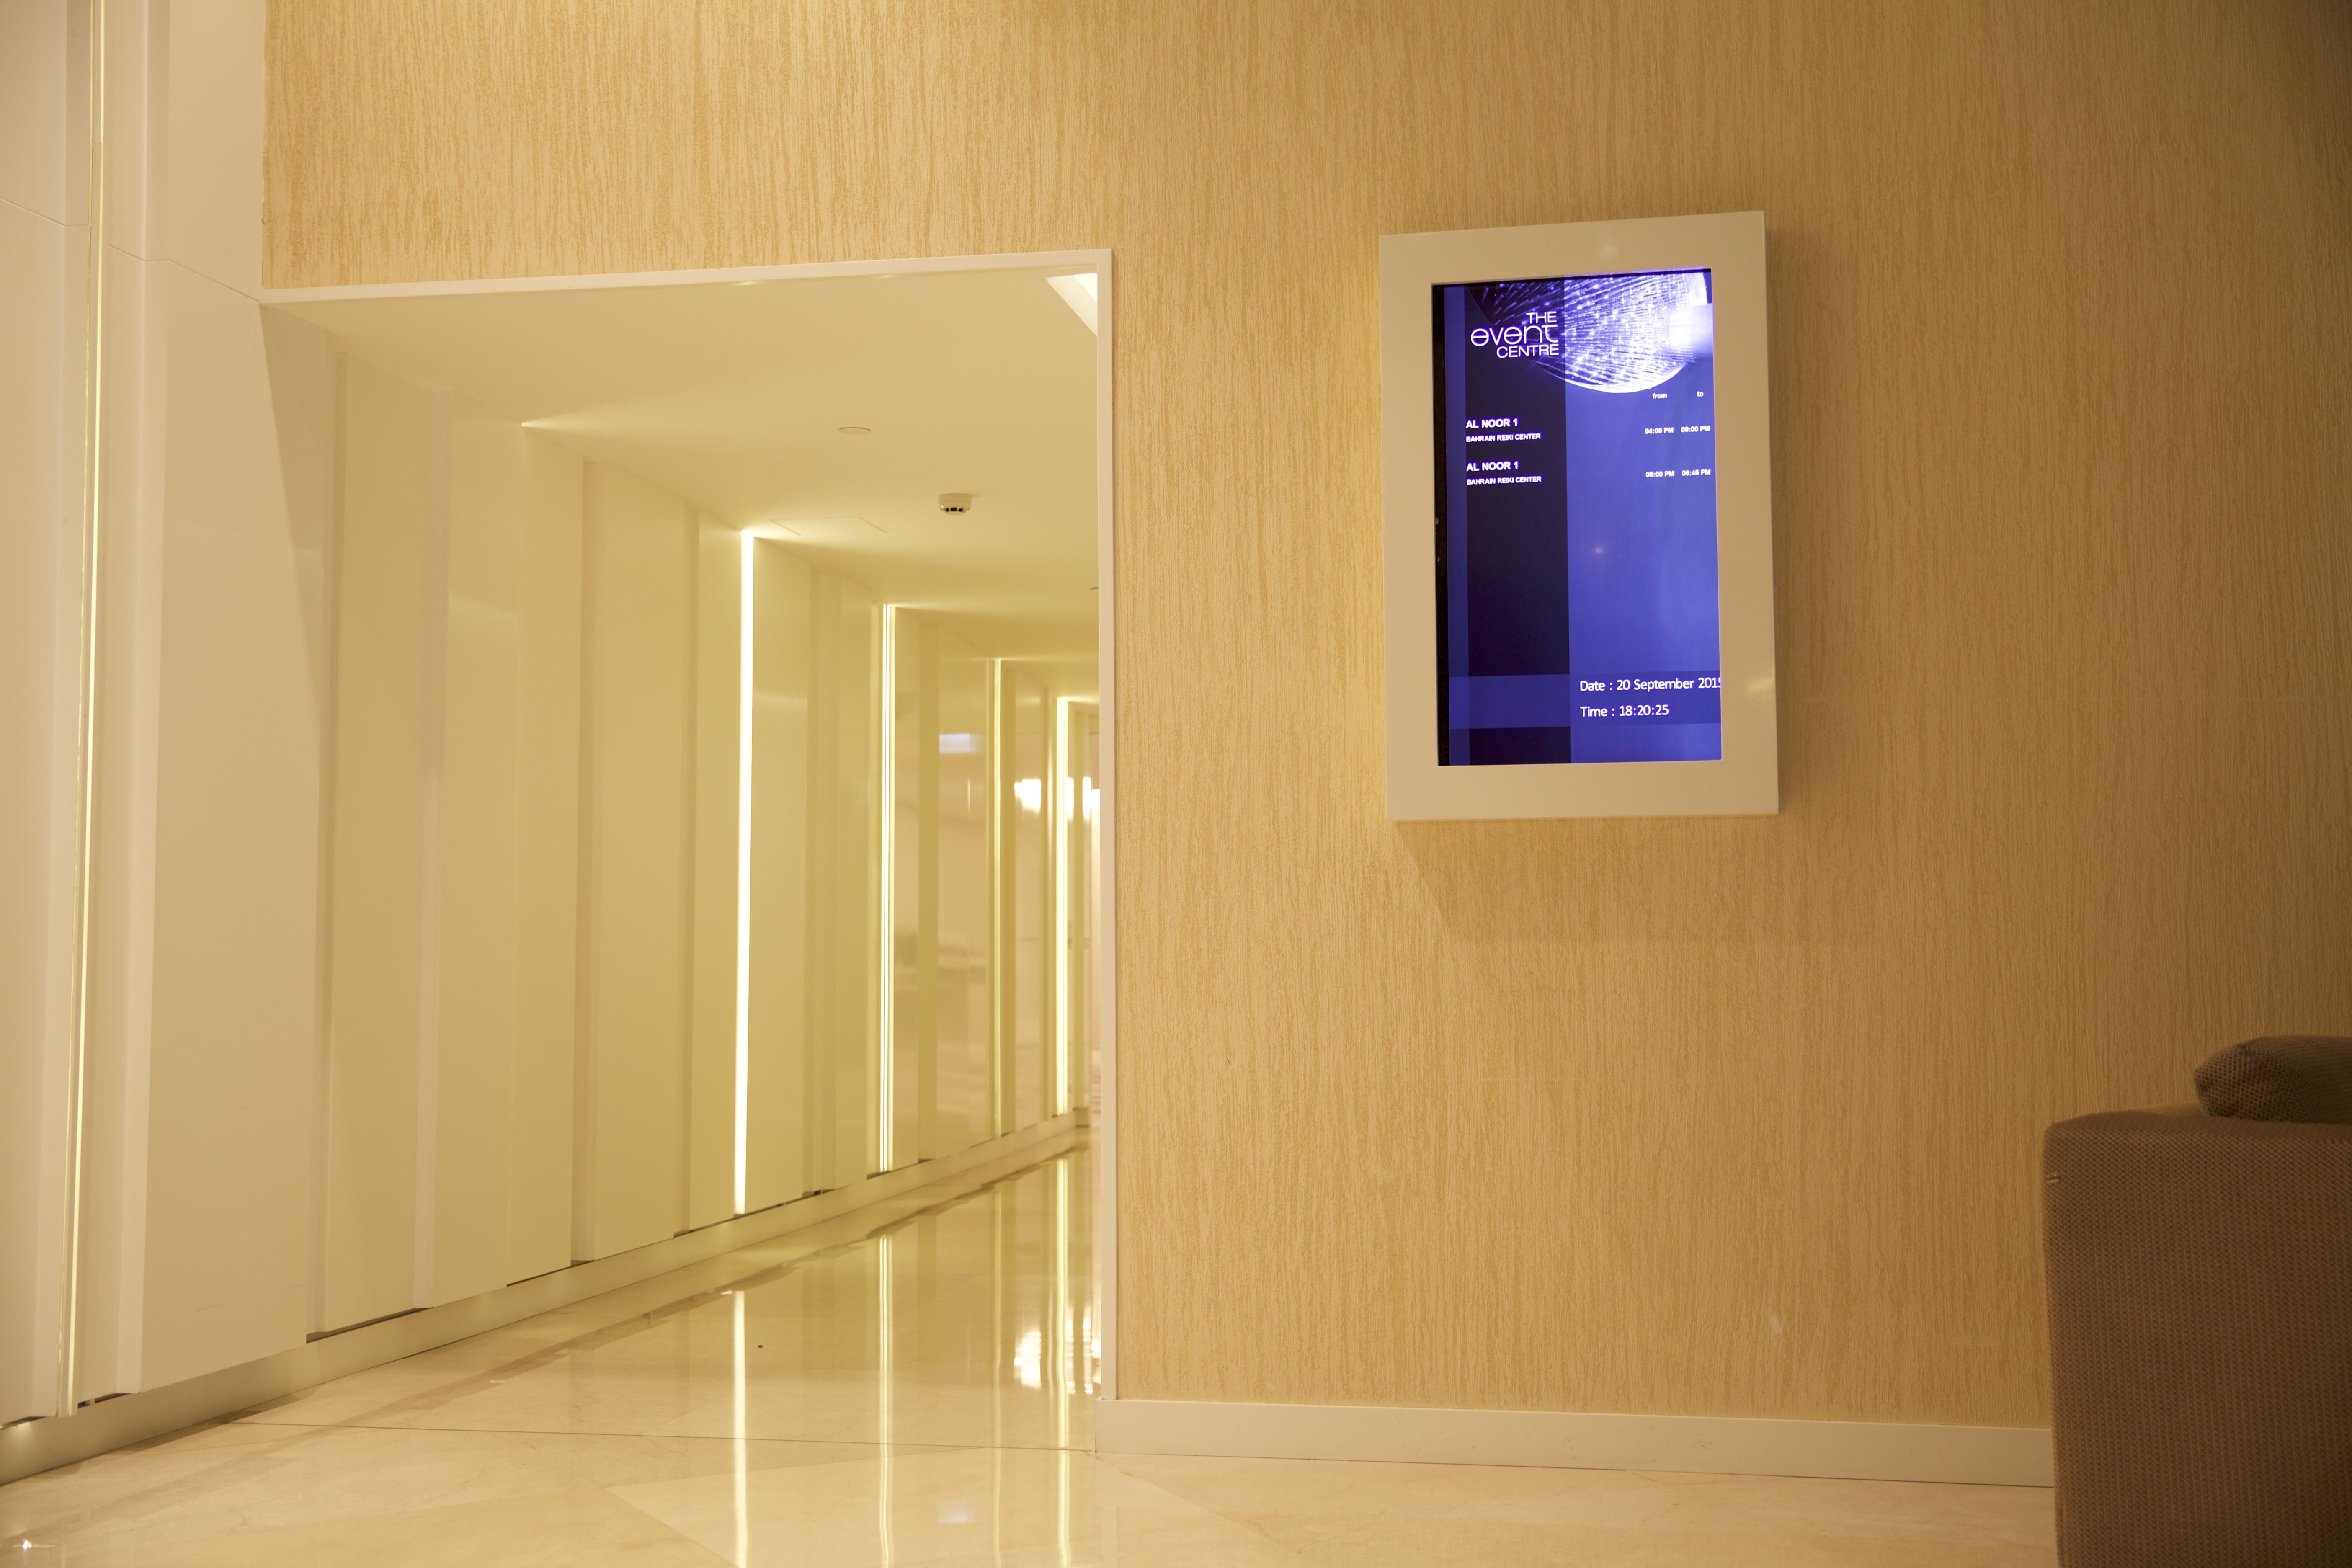 Intercontinental Hotel Digital Sign